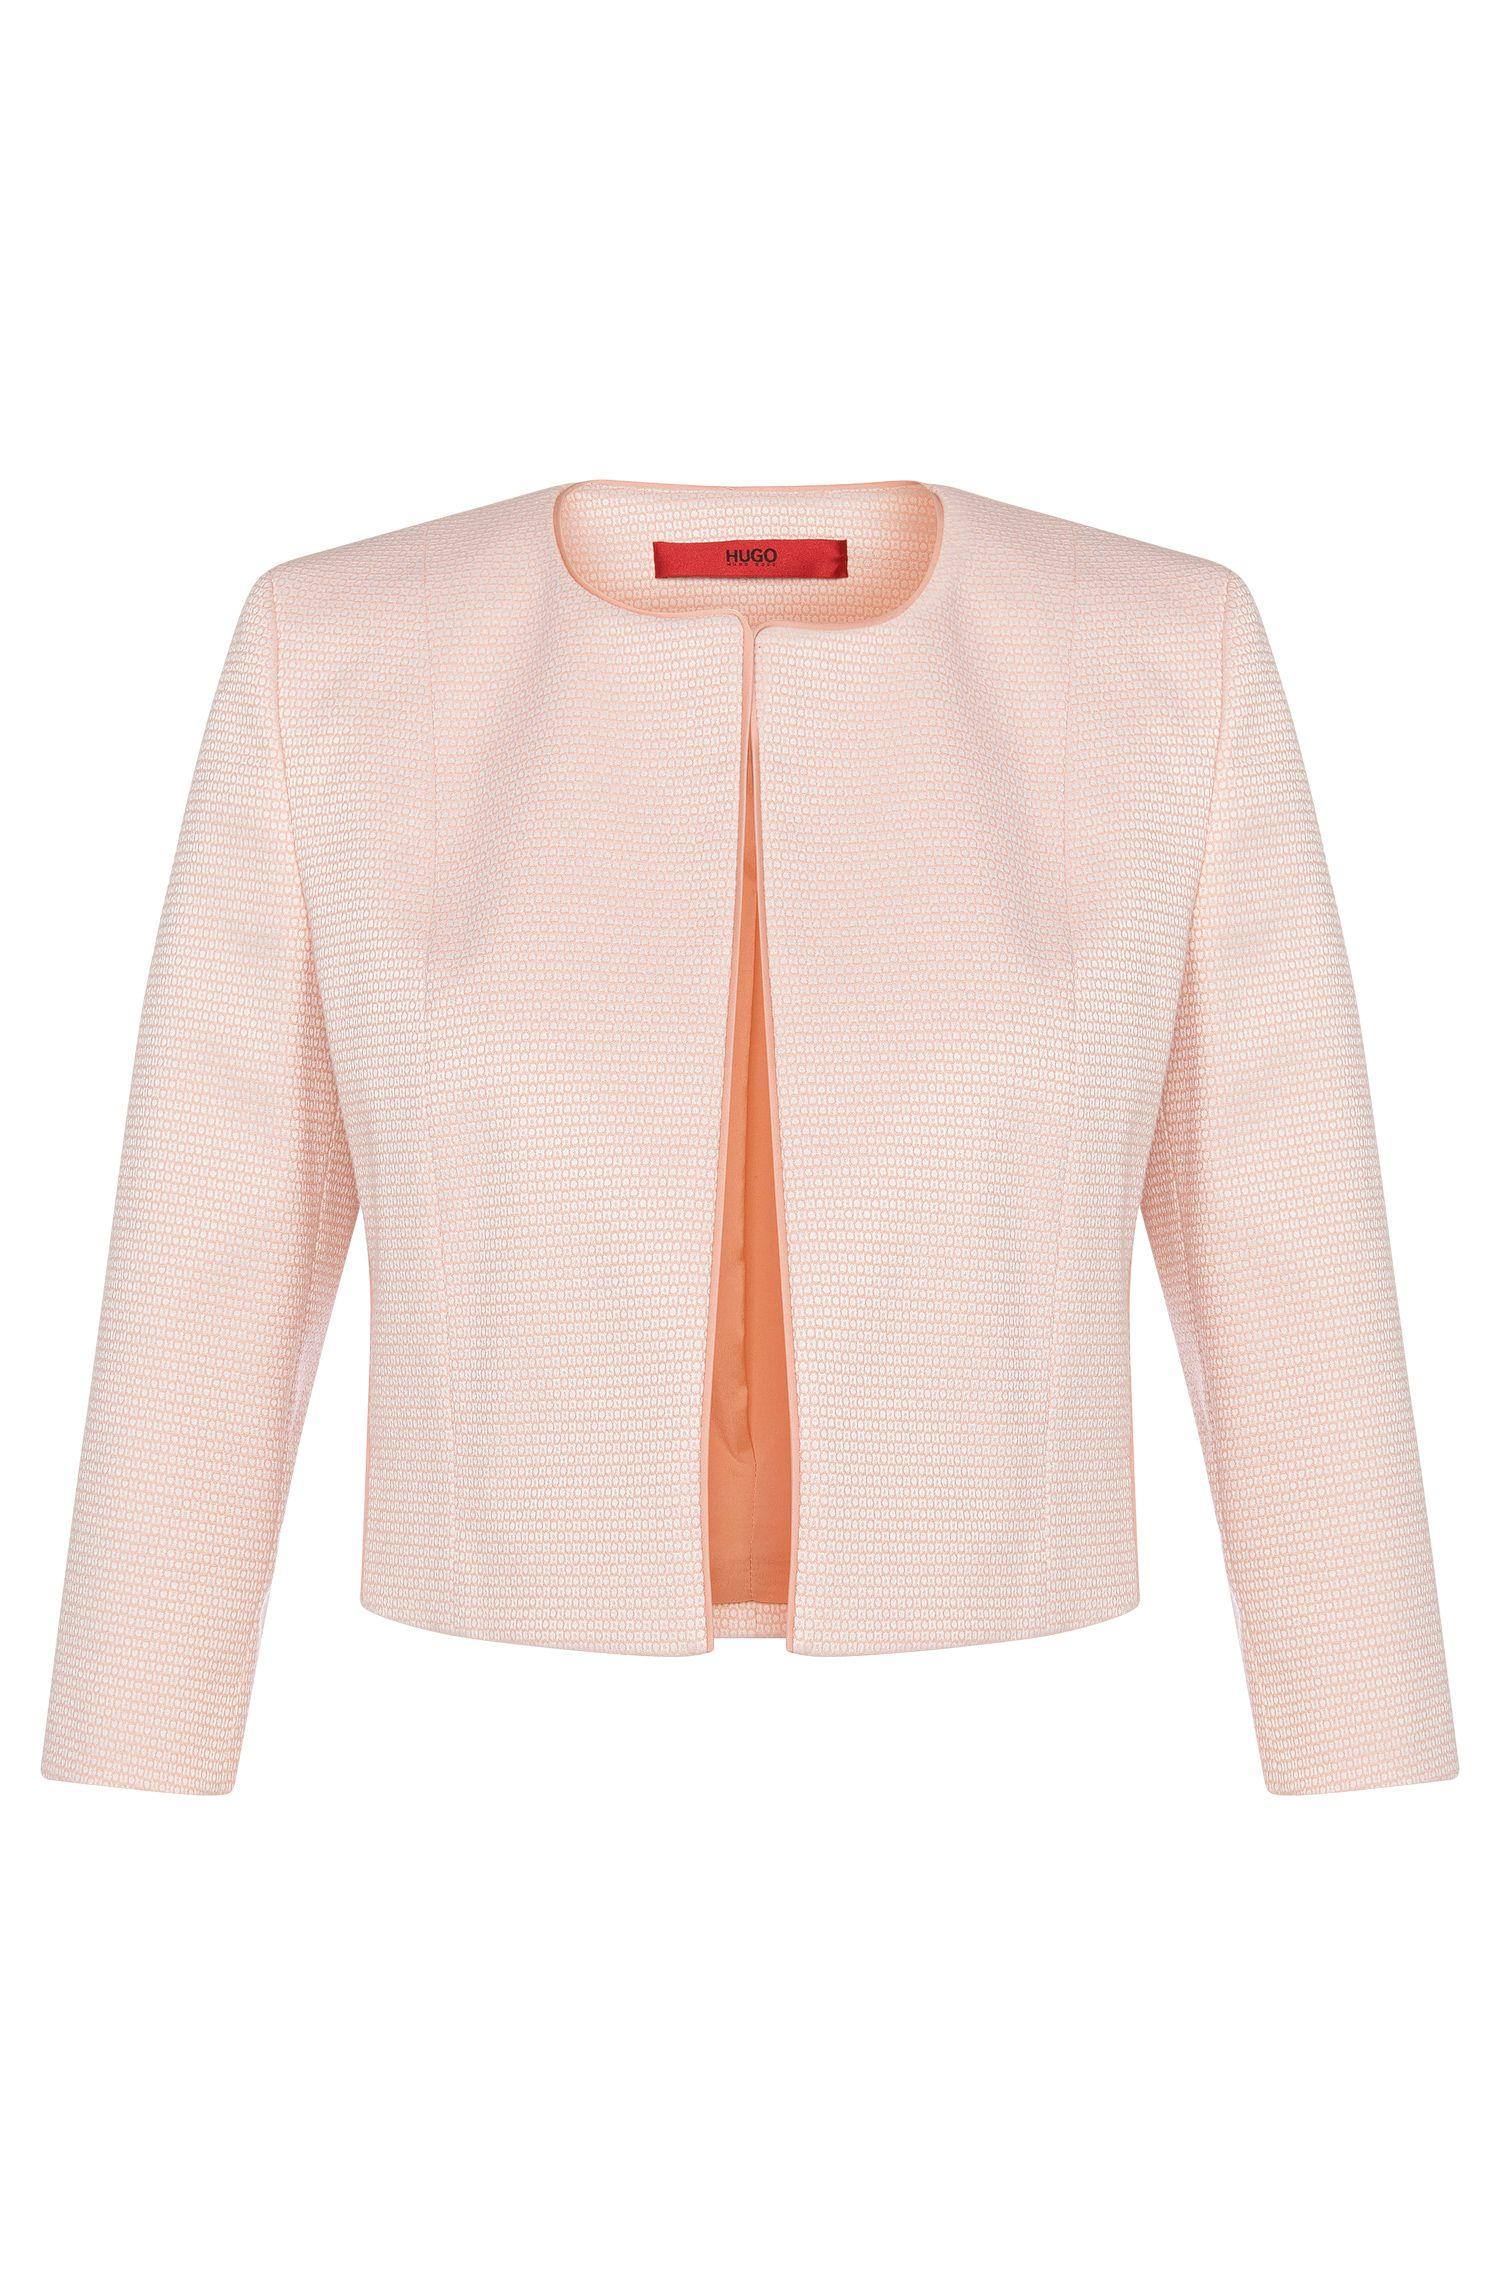 Open short blazer in stretchy cotton blend: 'Aveni'